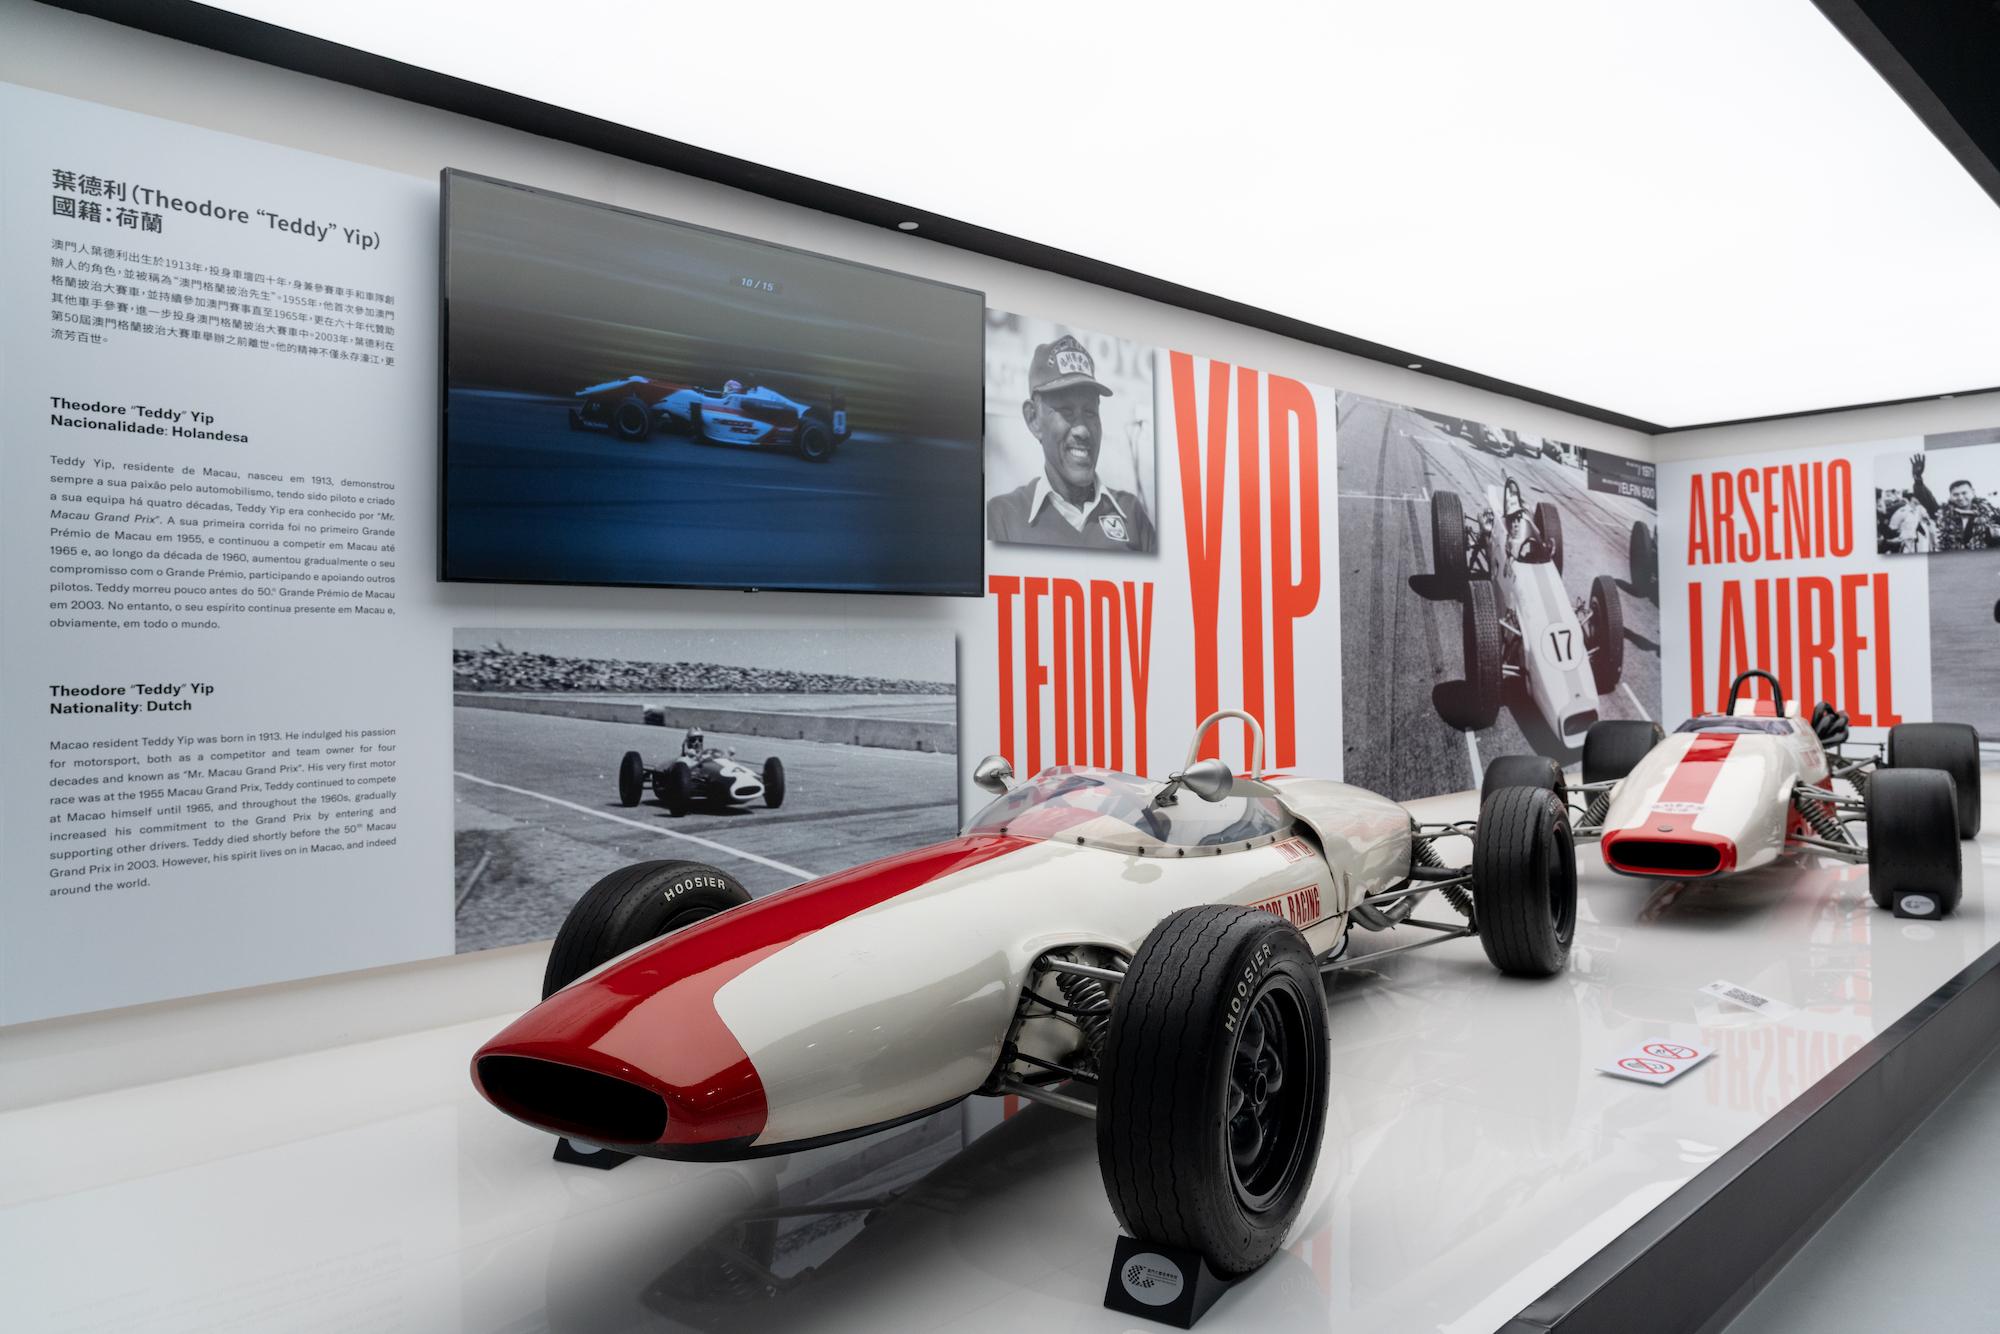 Teddy Yip's Theodore Racing Formula 1 race car